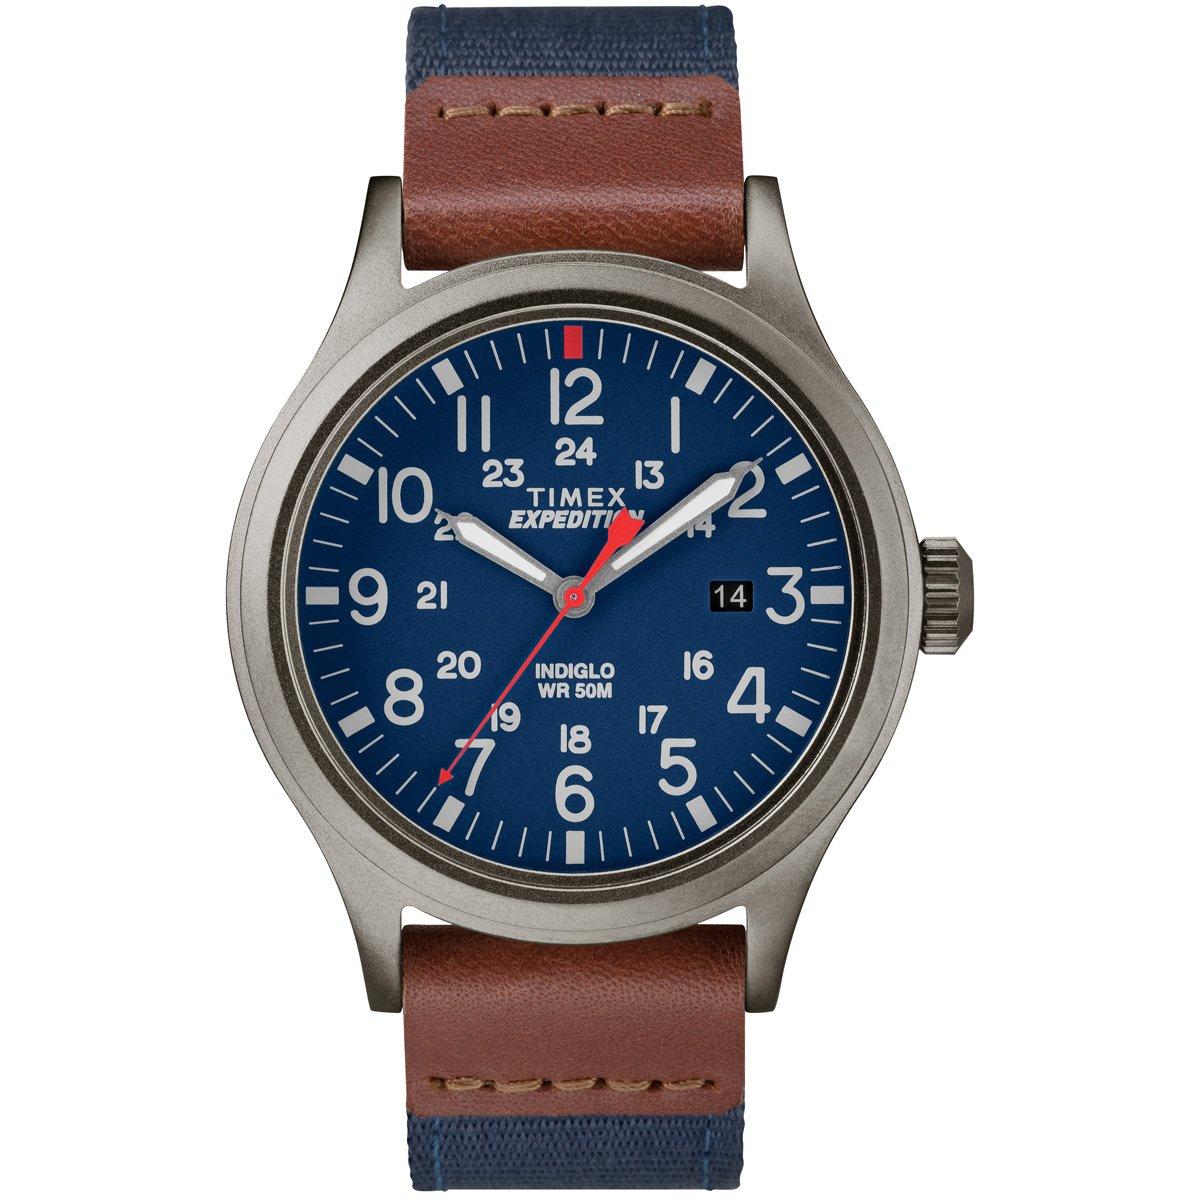 0bf7ba1b01f8 Reloj Caballero Expedition Timex TW4B14100